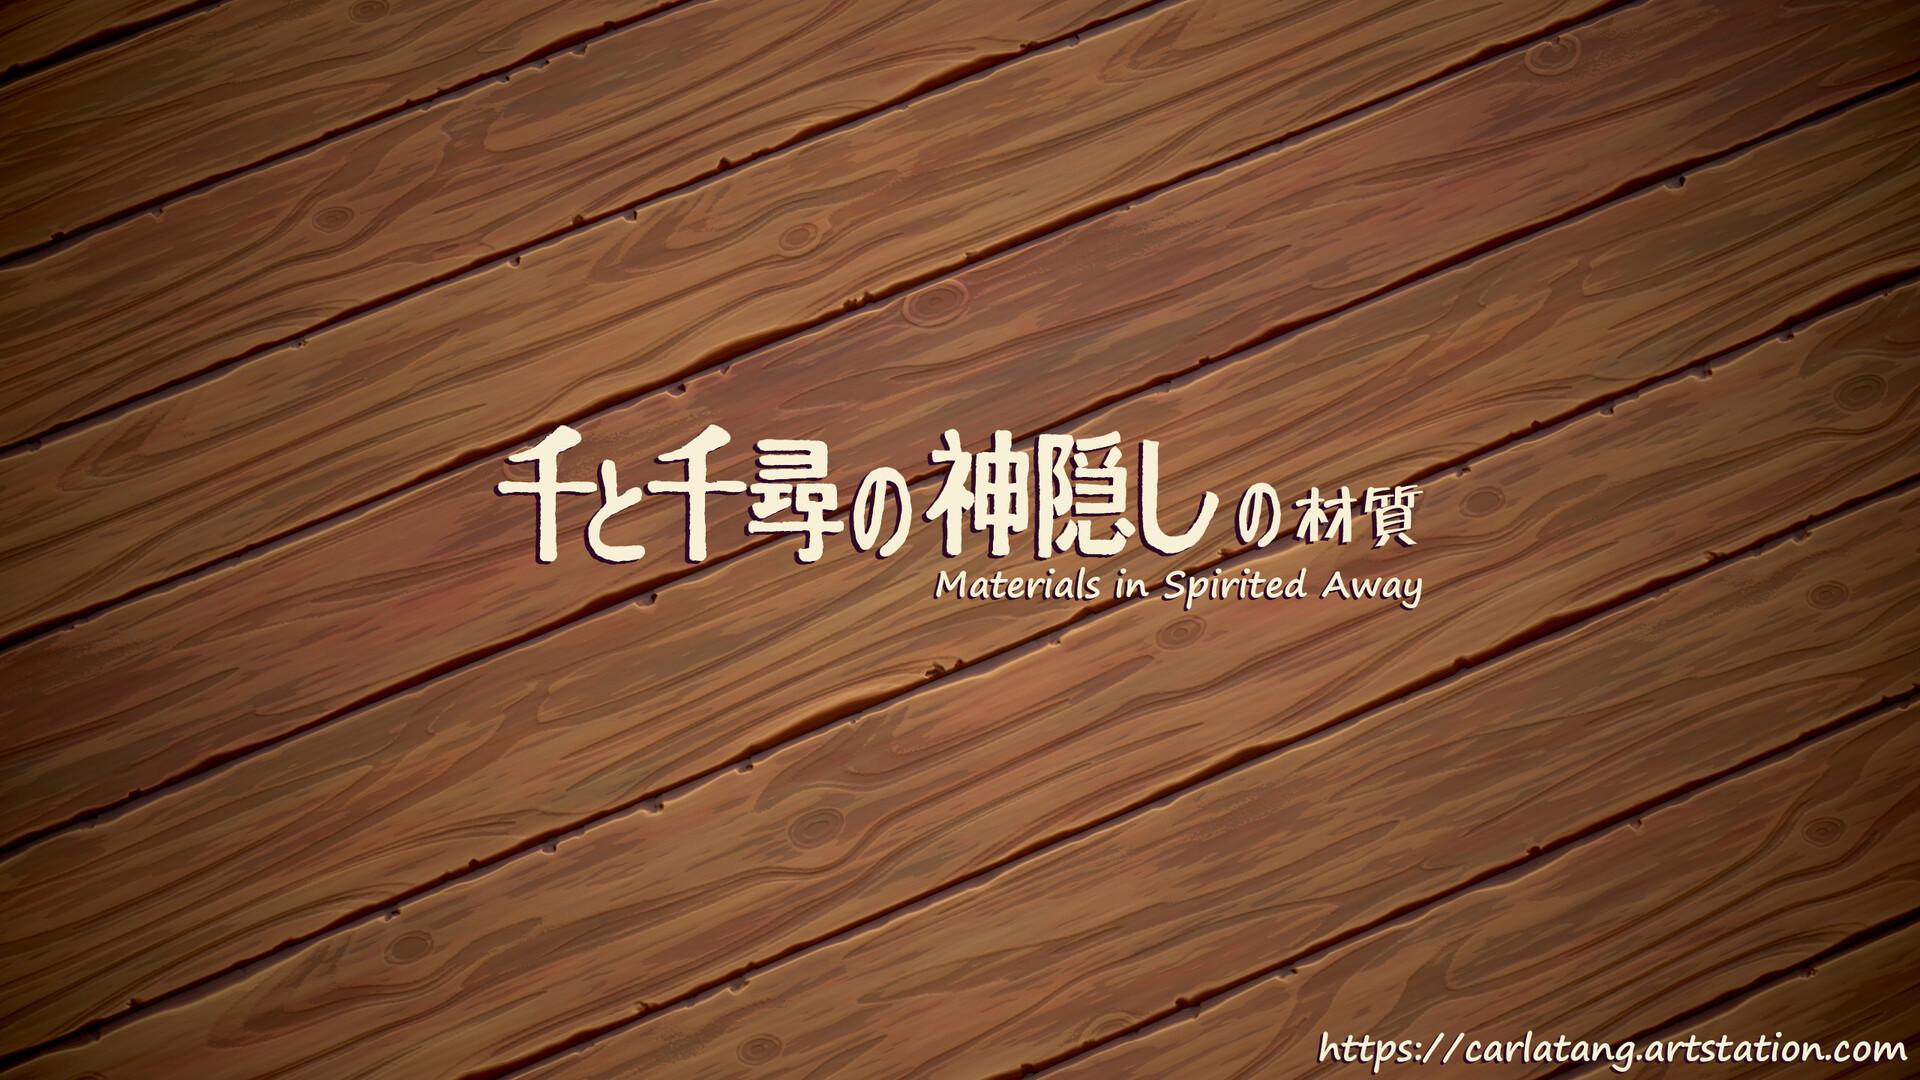 Carla tang sa wood floor preview